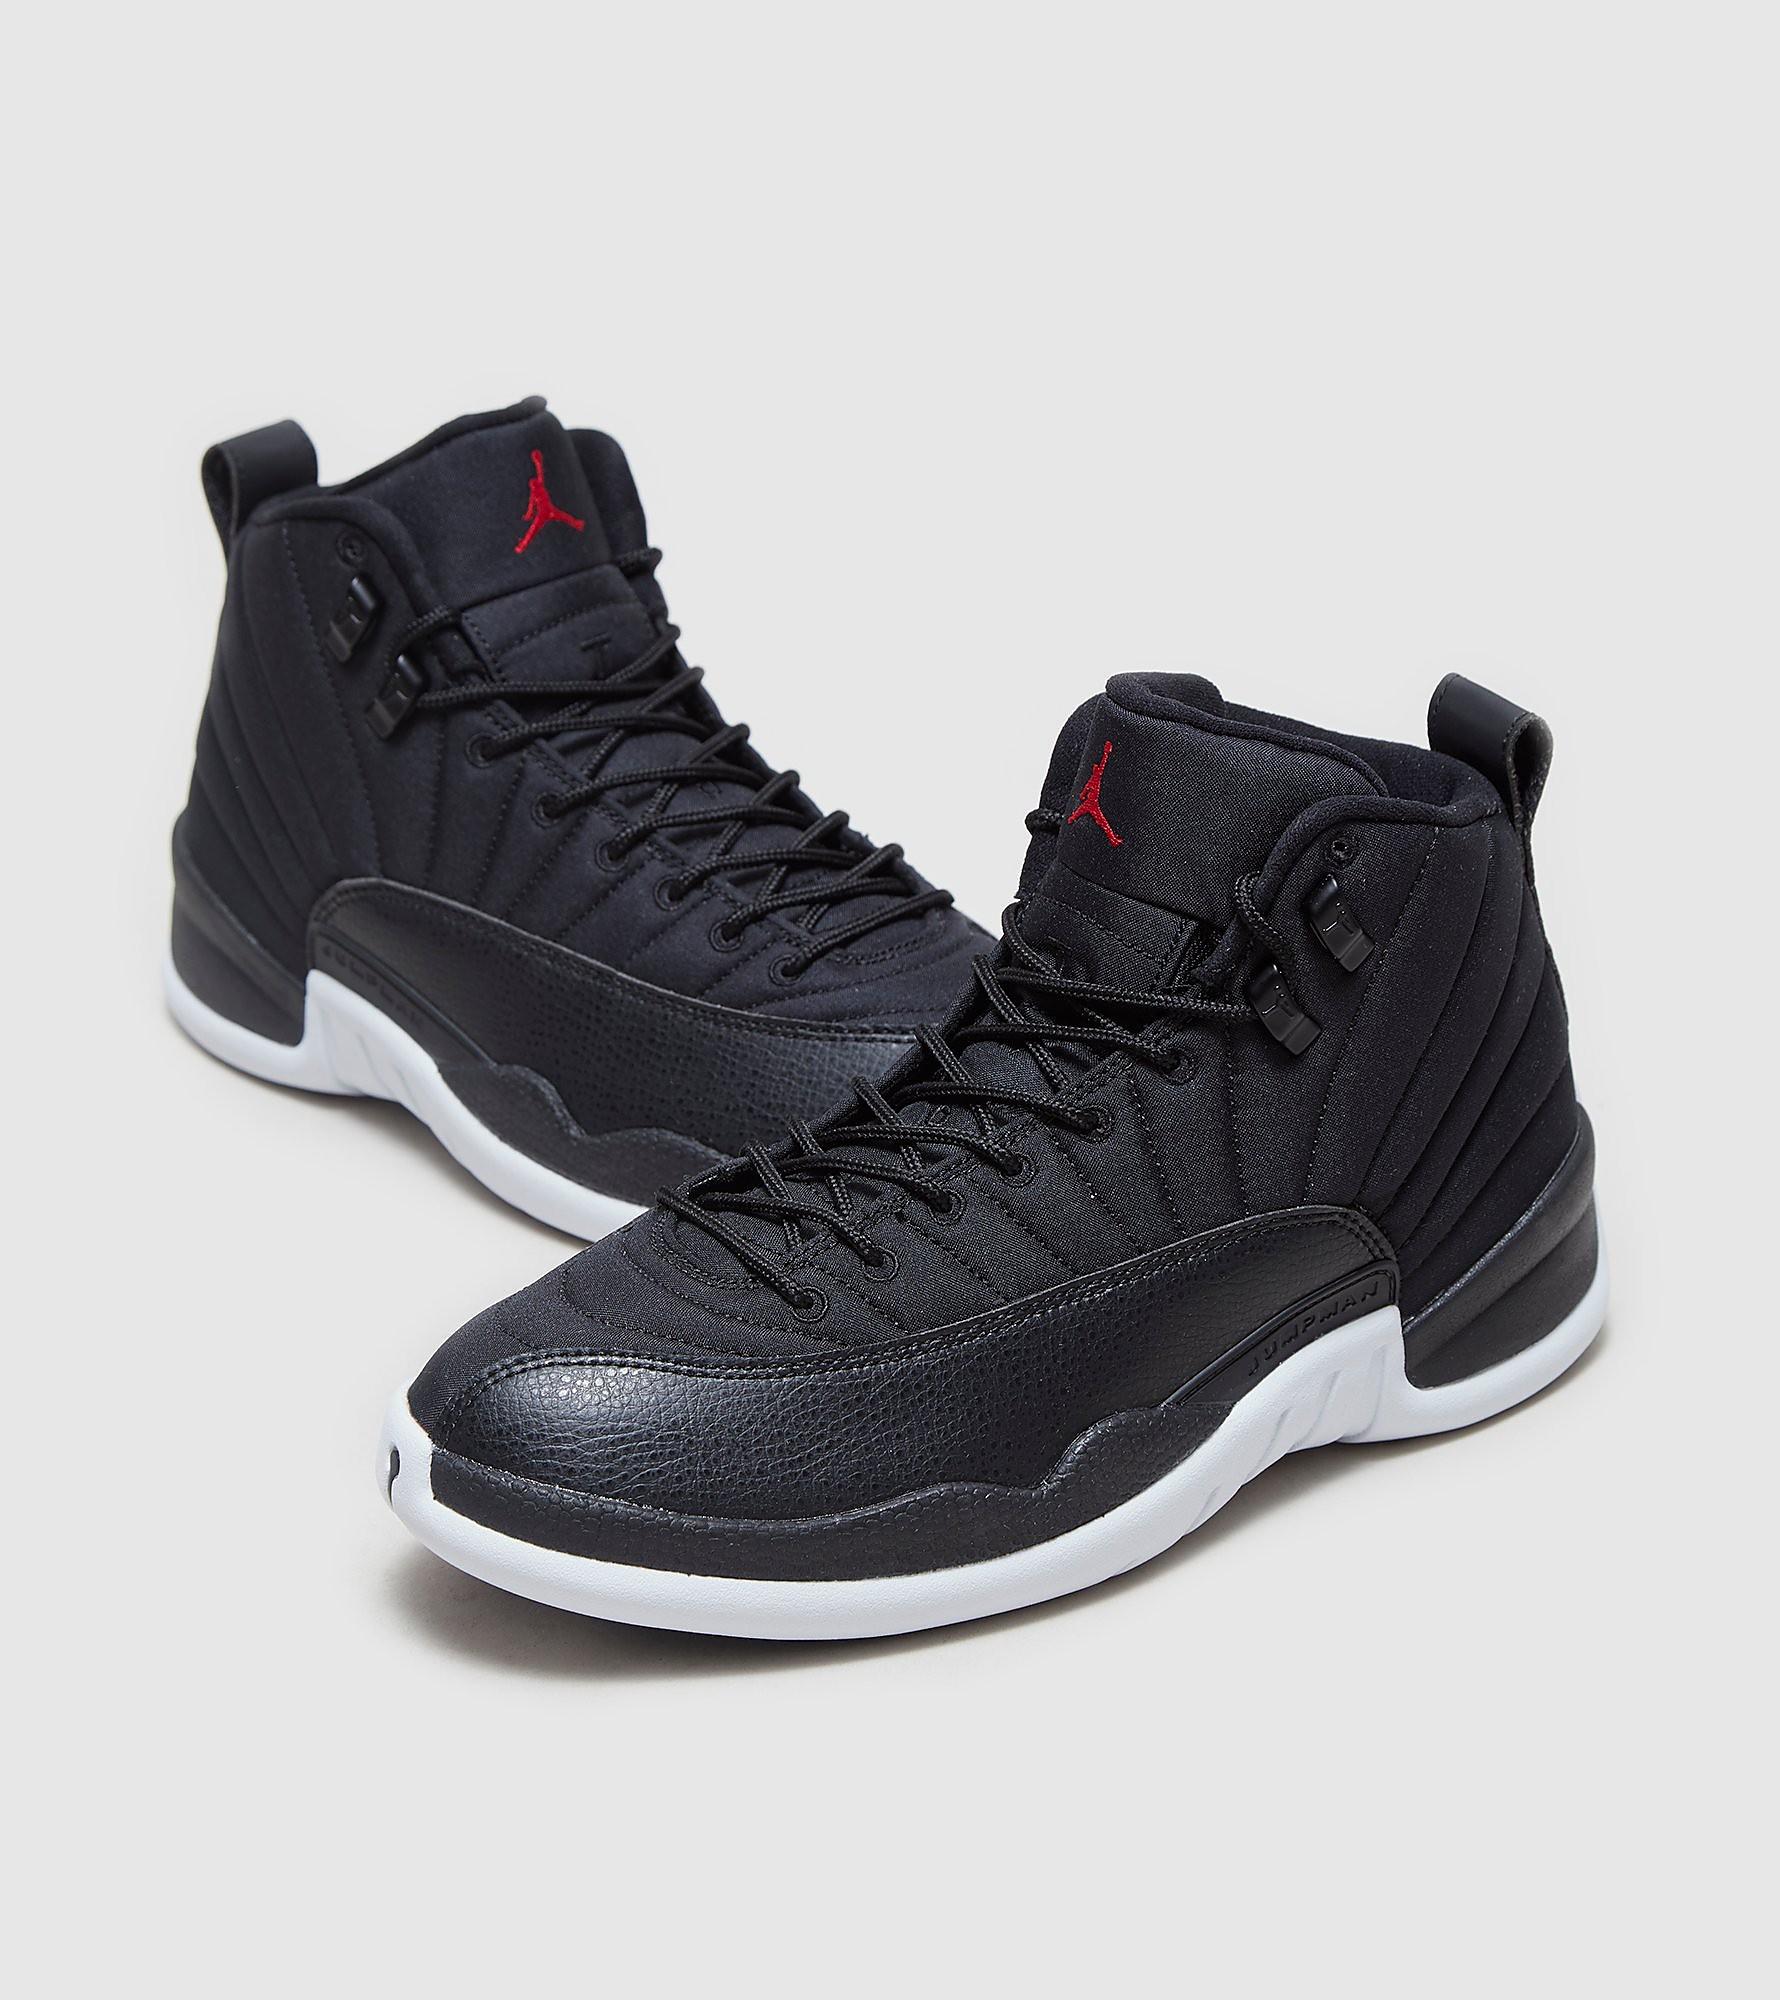 Jordan Air Retro 12 'Black'